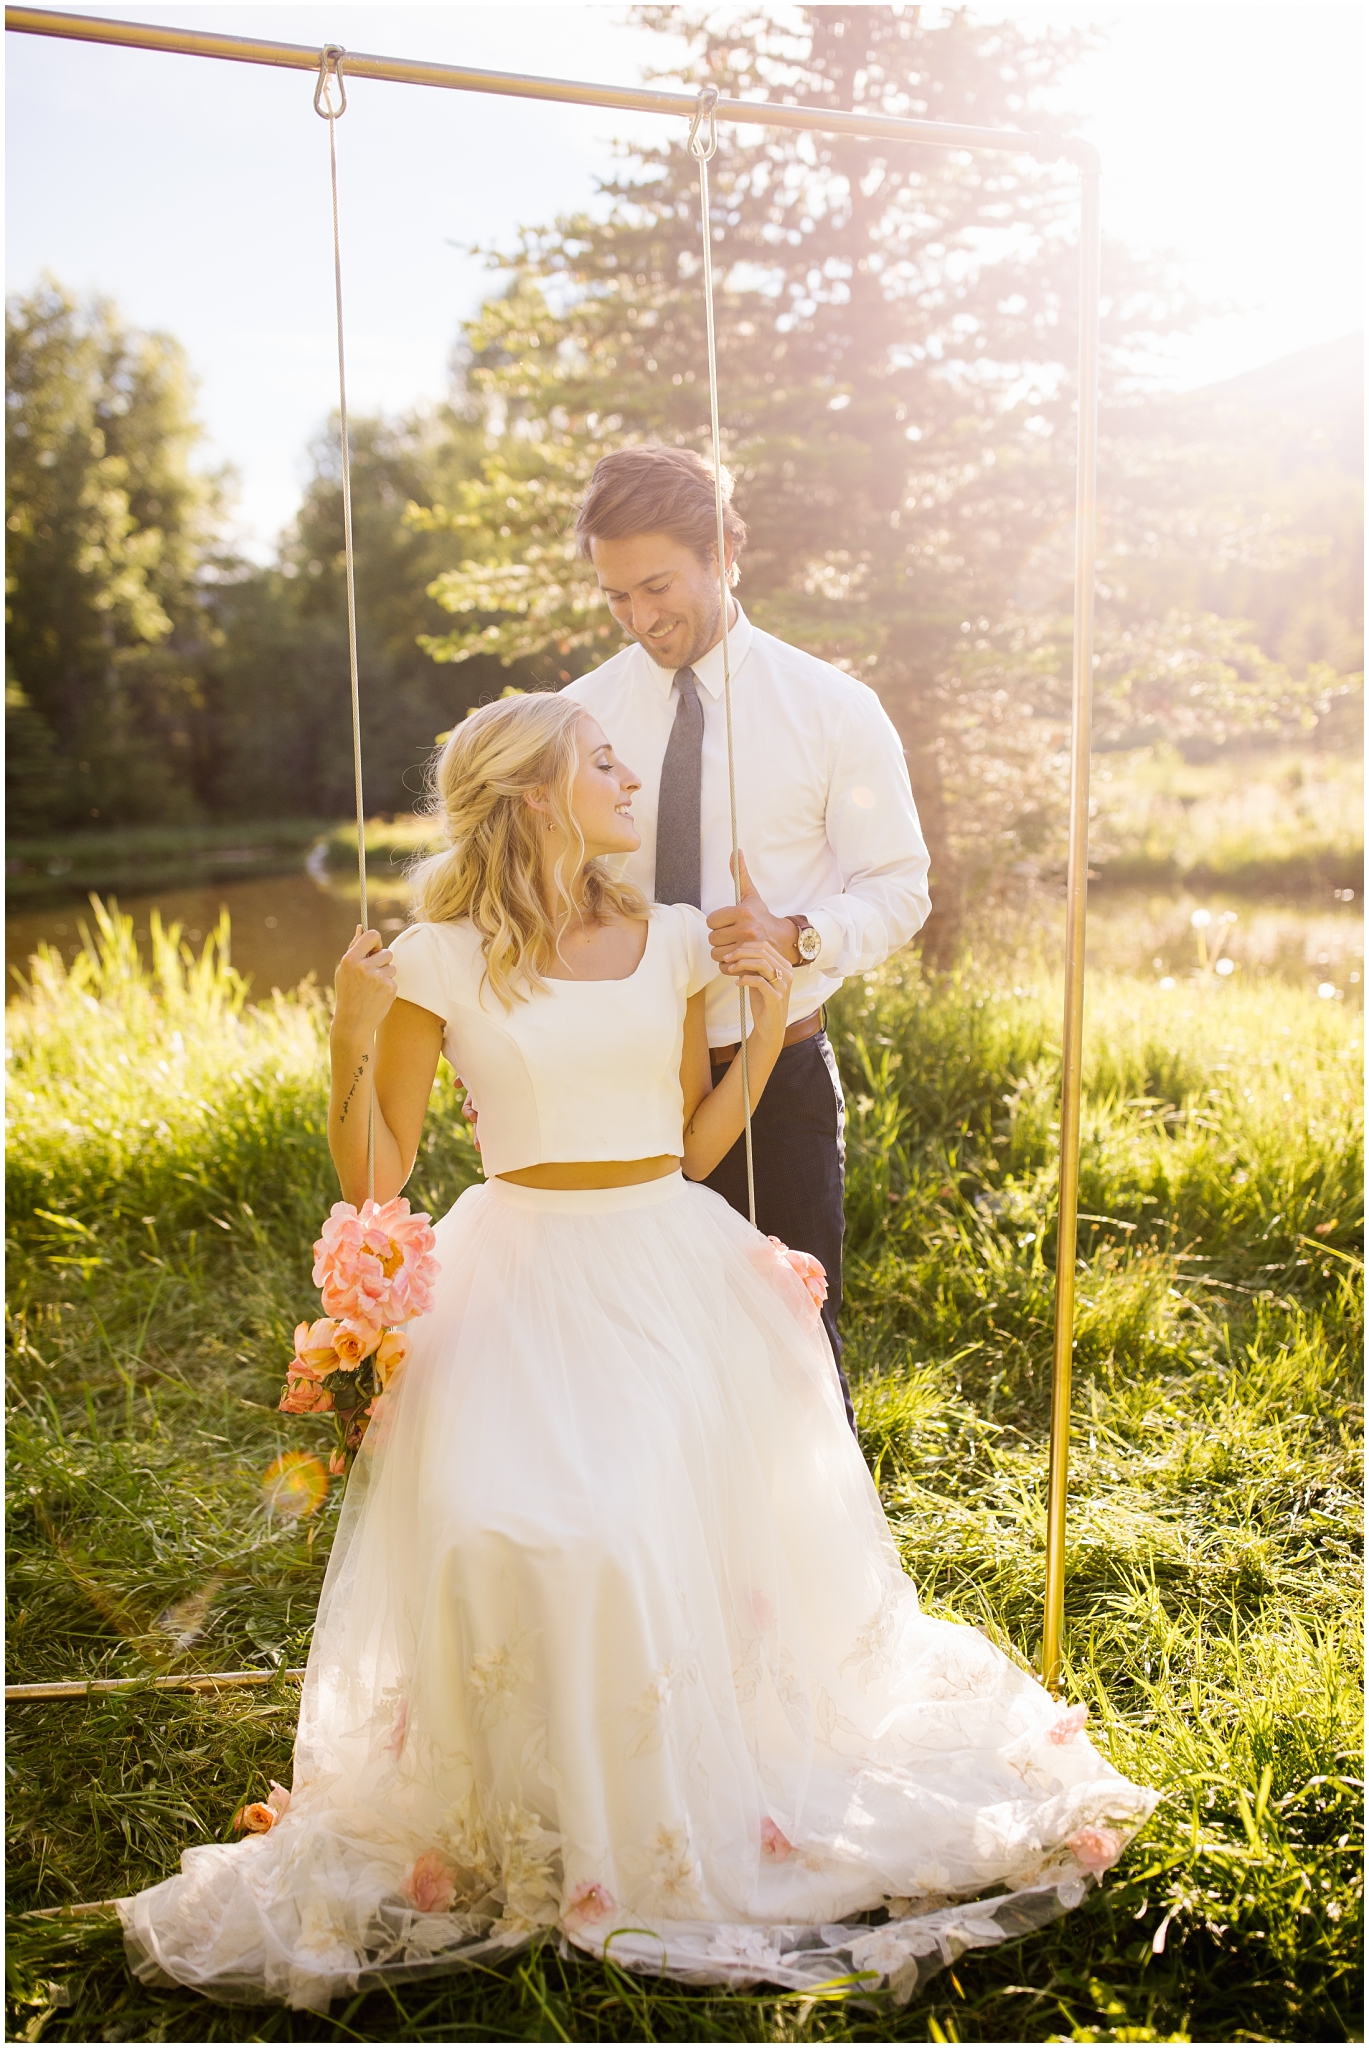 LakeShoot-22_Lizzie-B-Imagery-Utah-Wedding-Photographer-Salt-Lake-City-Park-City-Oakley.jpg